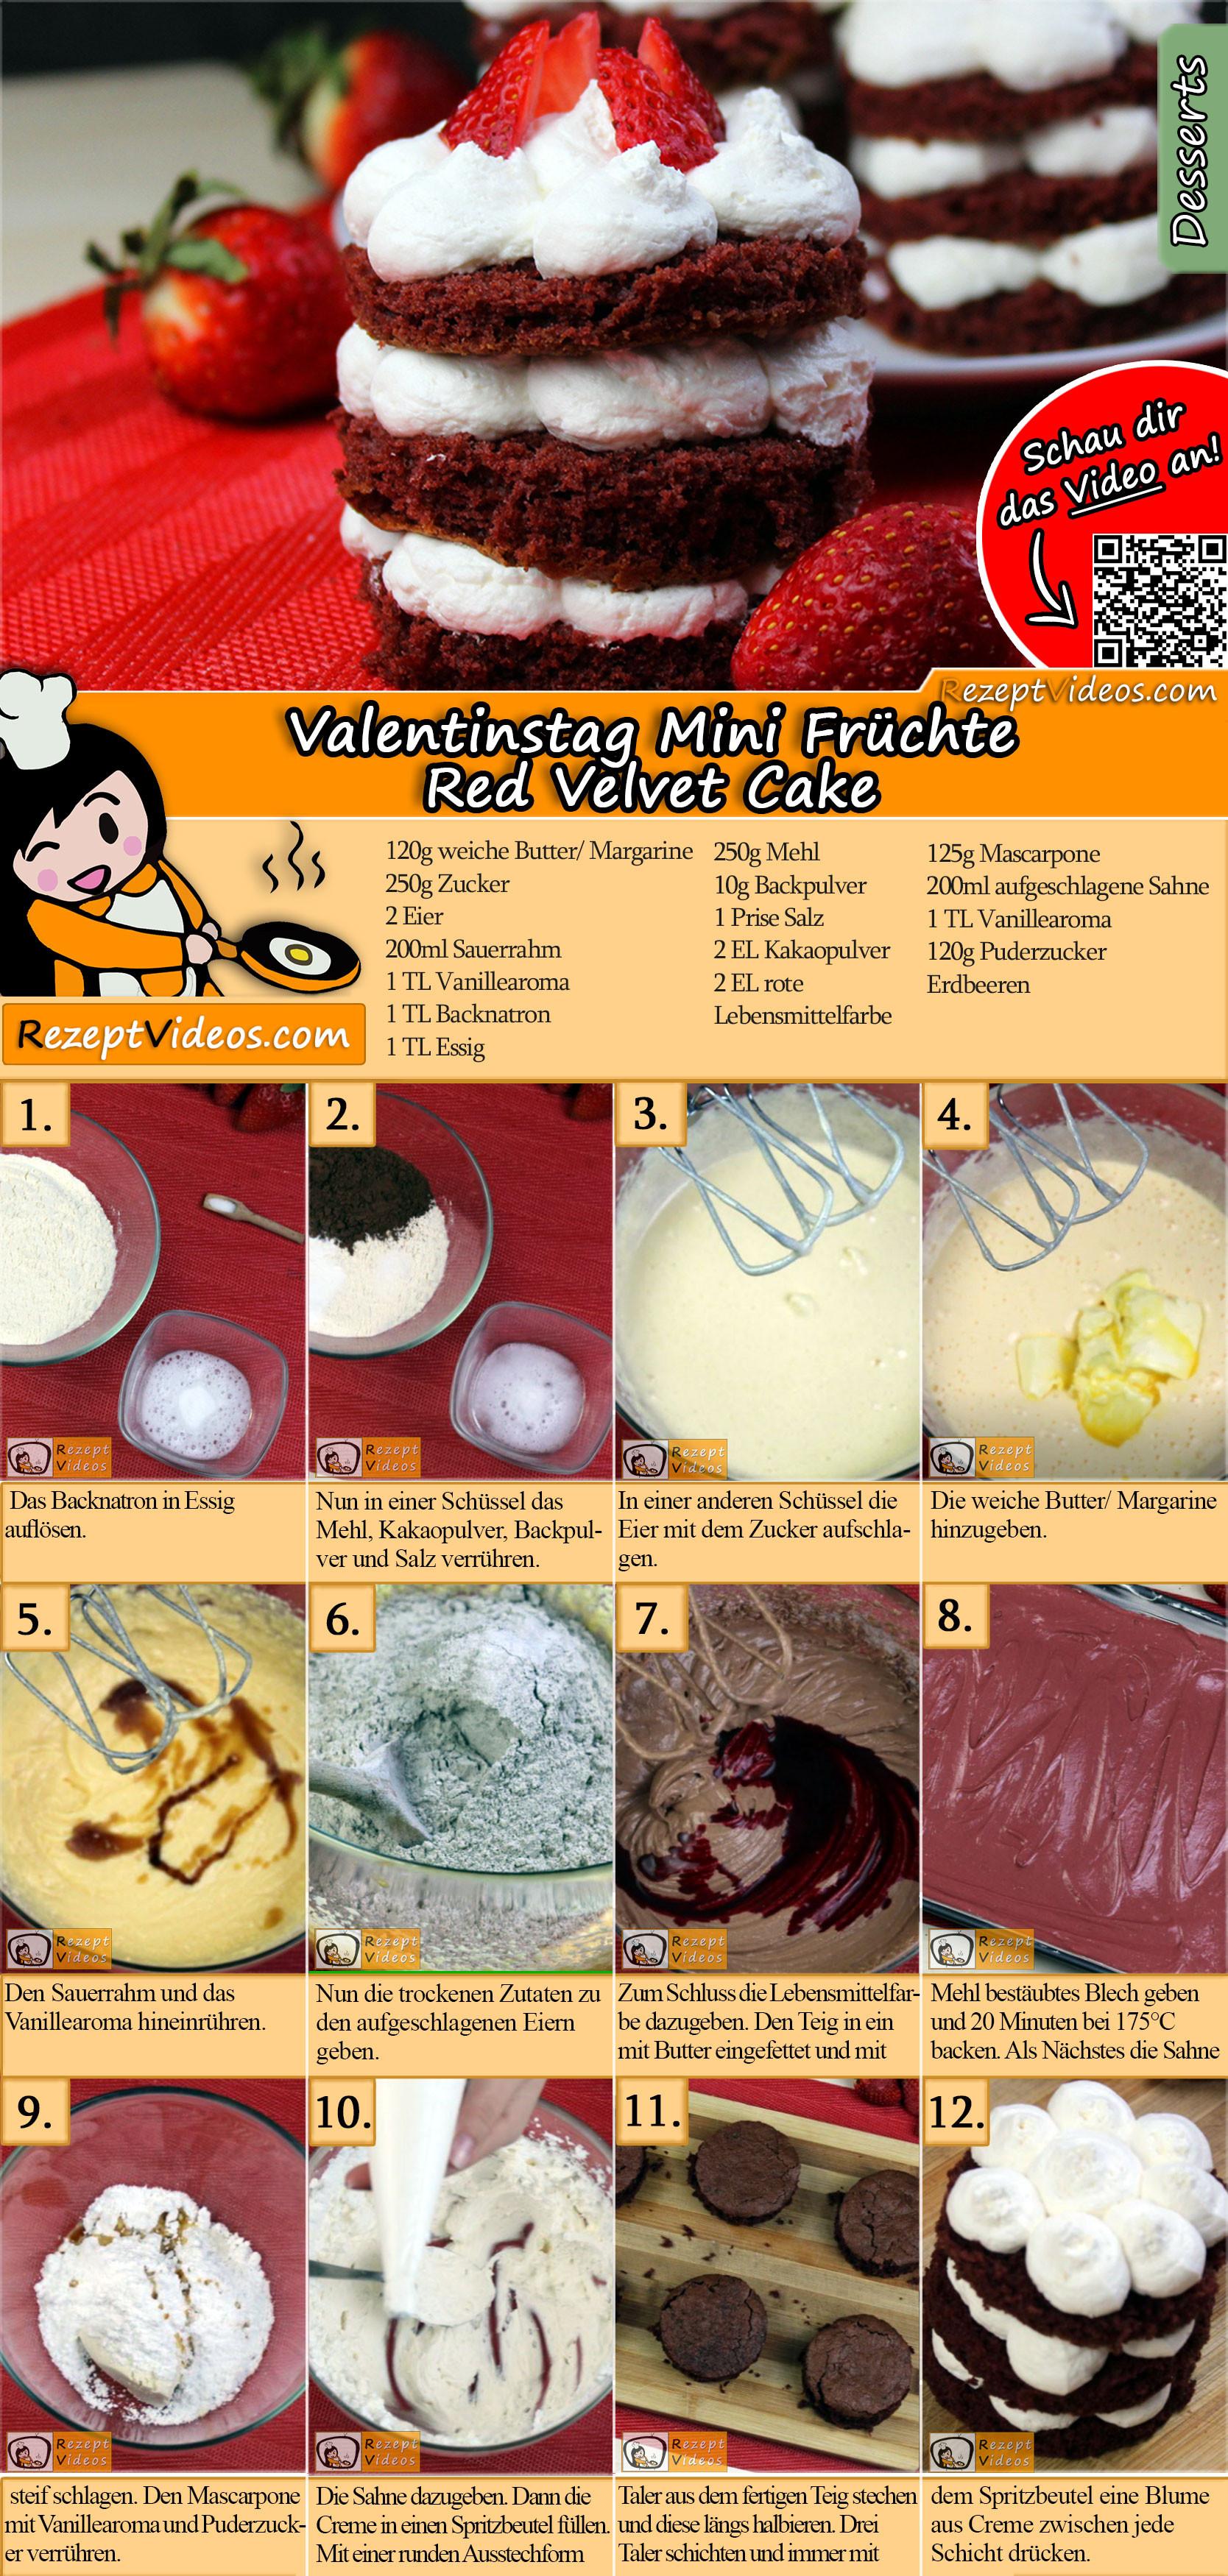 Valentinstag Mini Früchte Red Velvet Cake Rezept mit Video